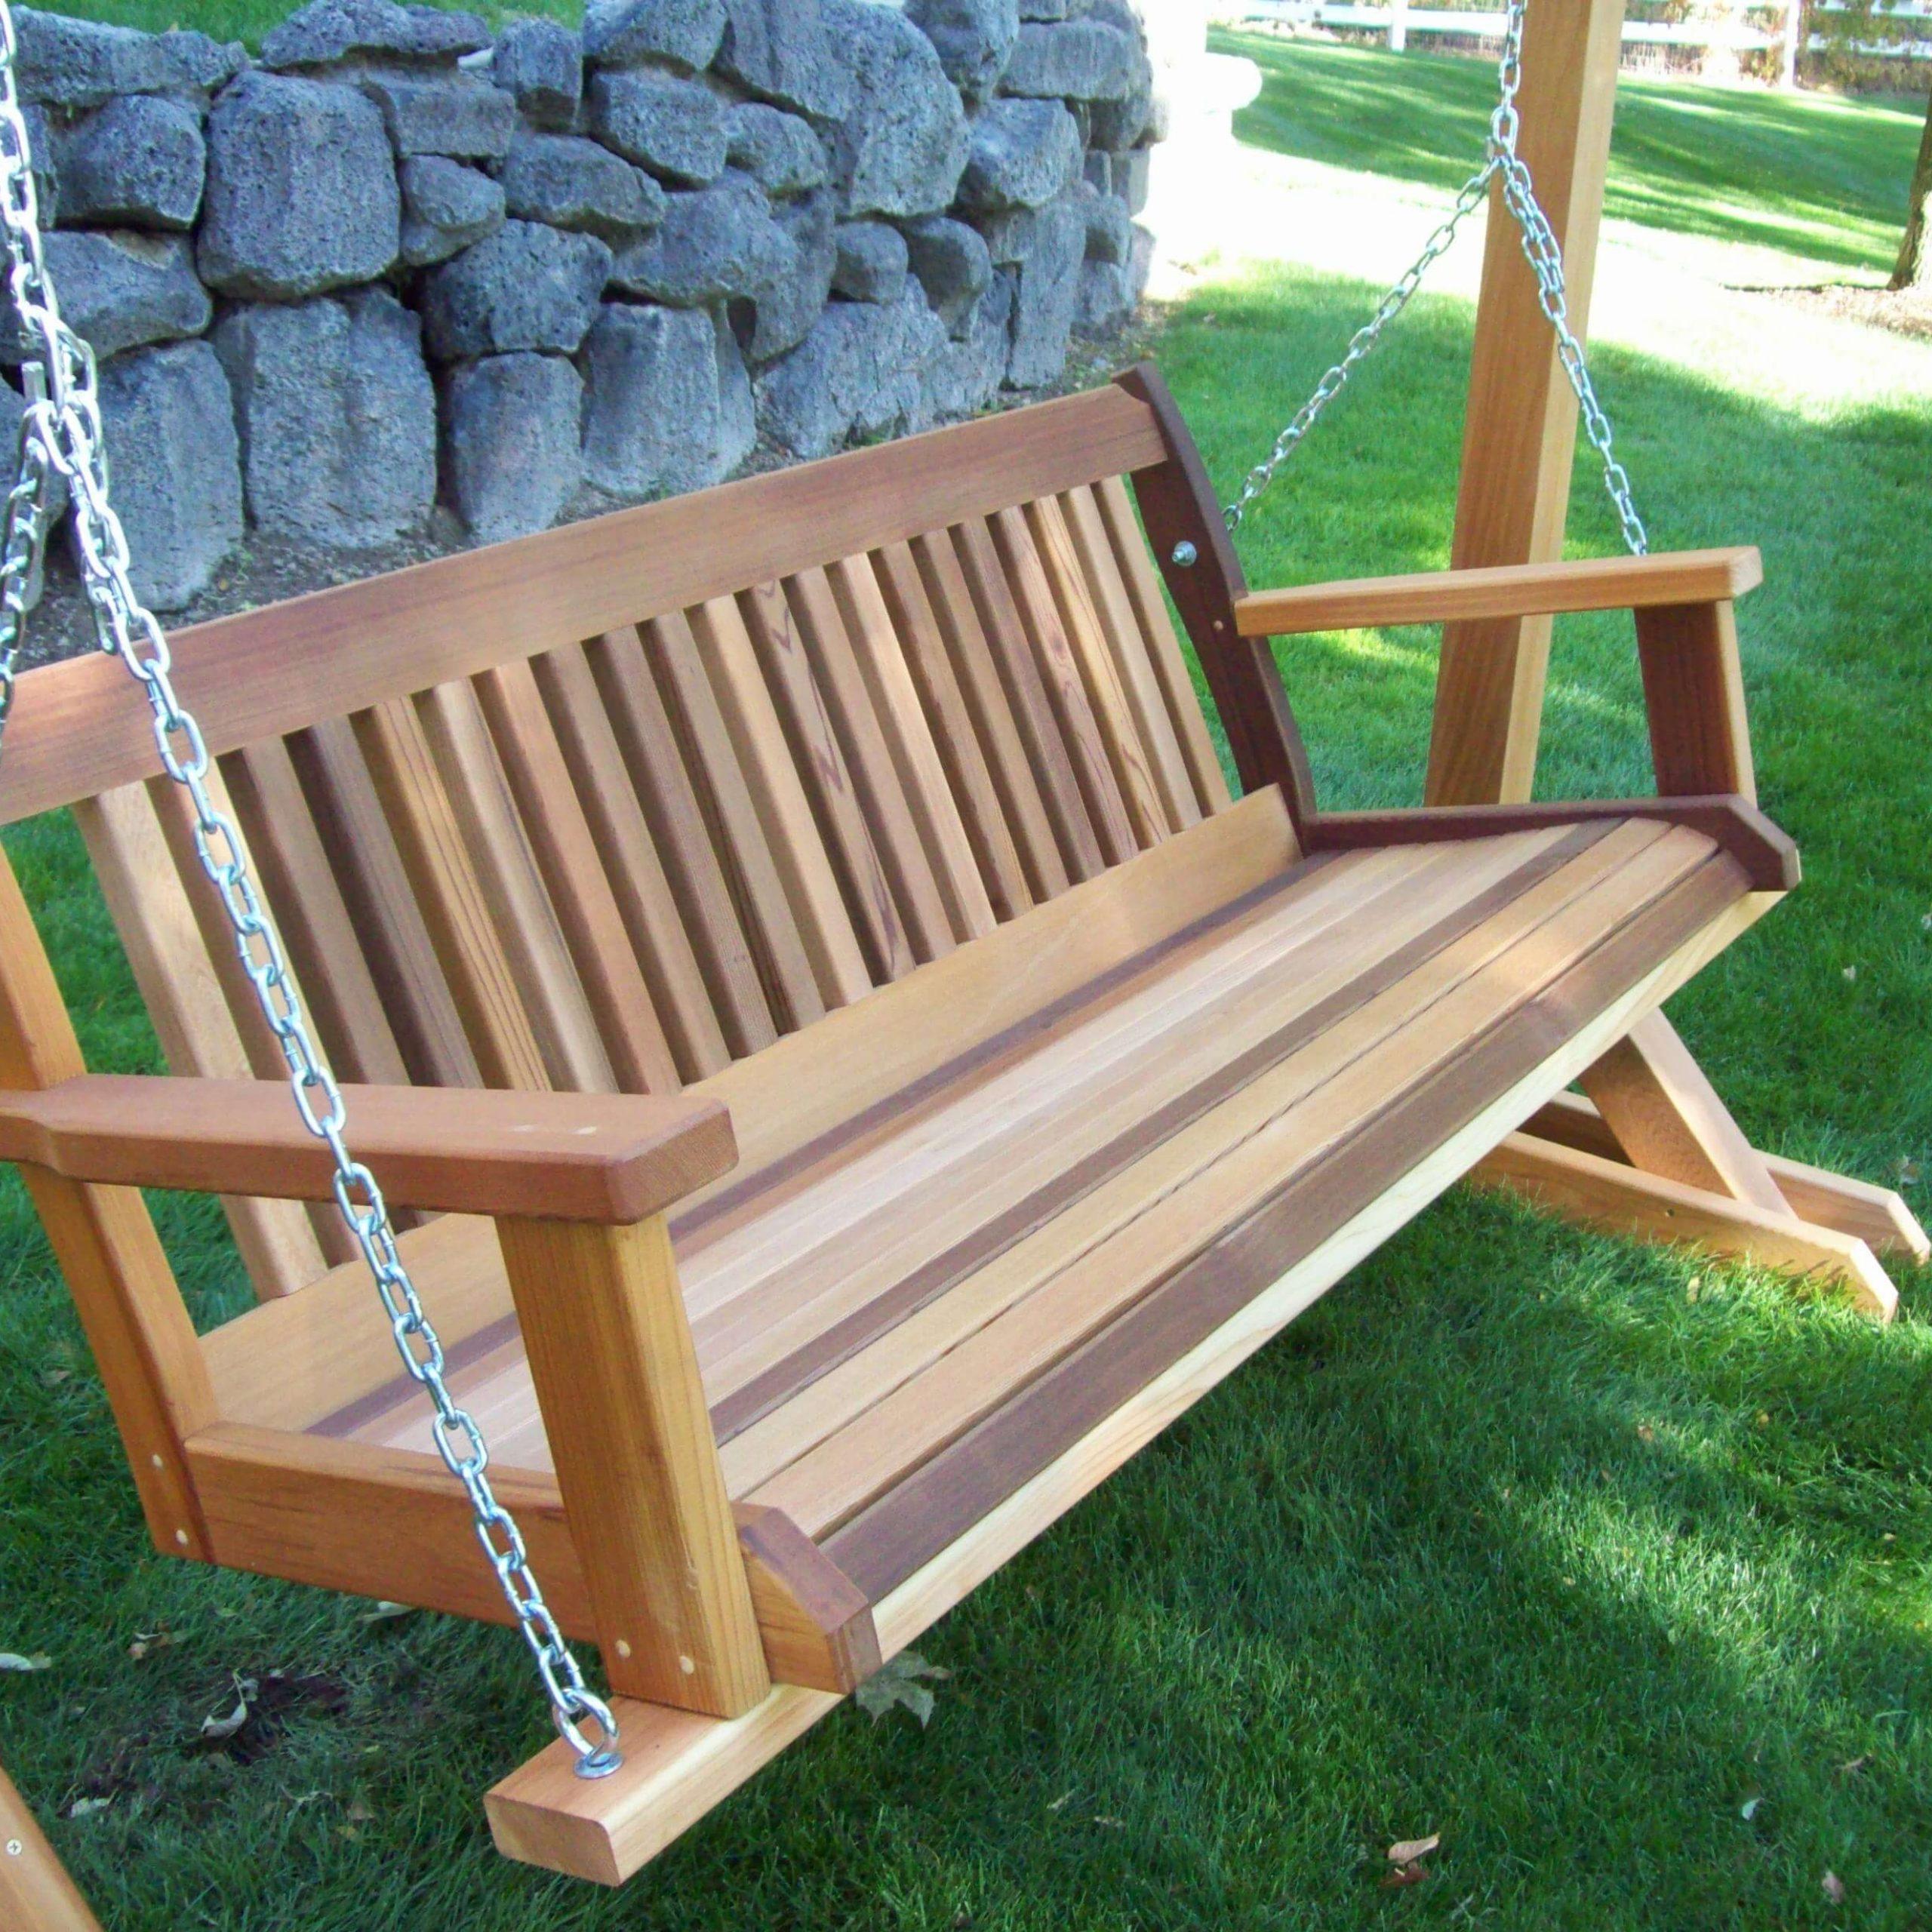 5′ Teak Porch Swing Throughout Teak Porch Swings (View 10 of 25)